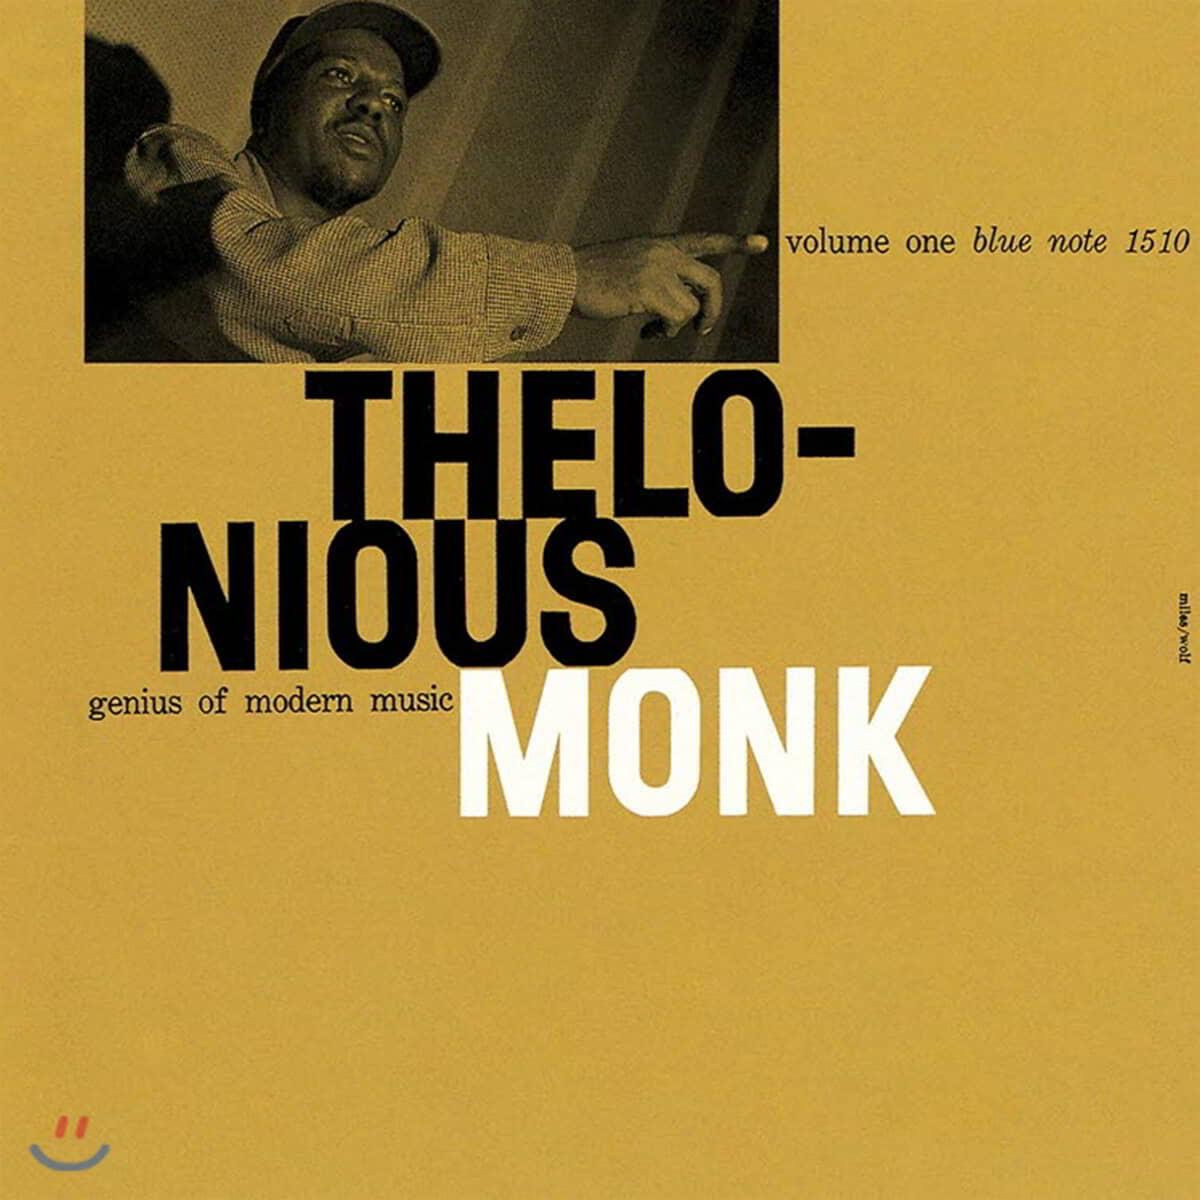 Thelonious Monk (델로니어스 몽크) - Genius of Modern Music Vol. 1